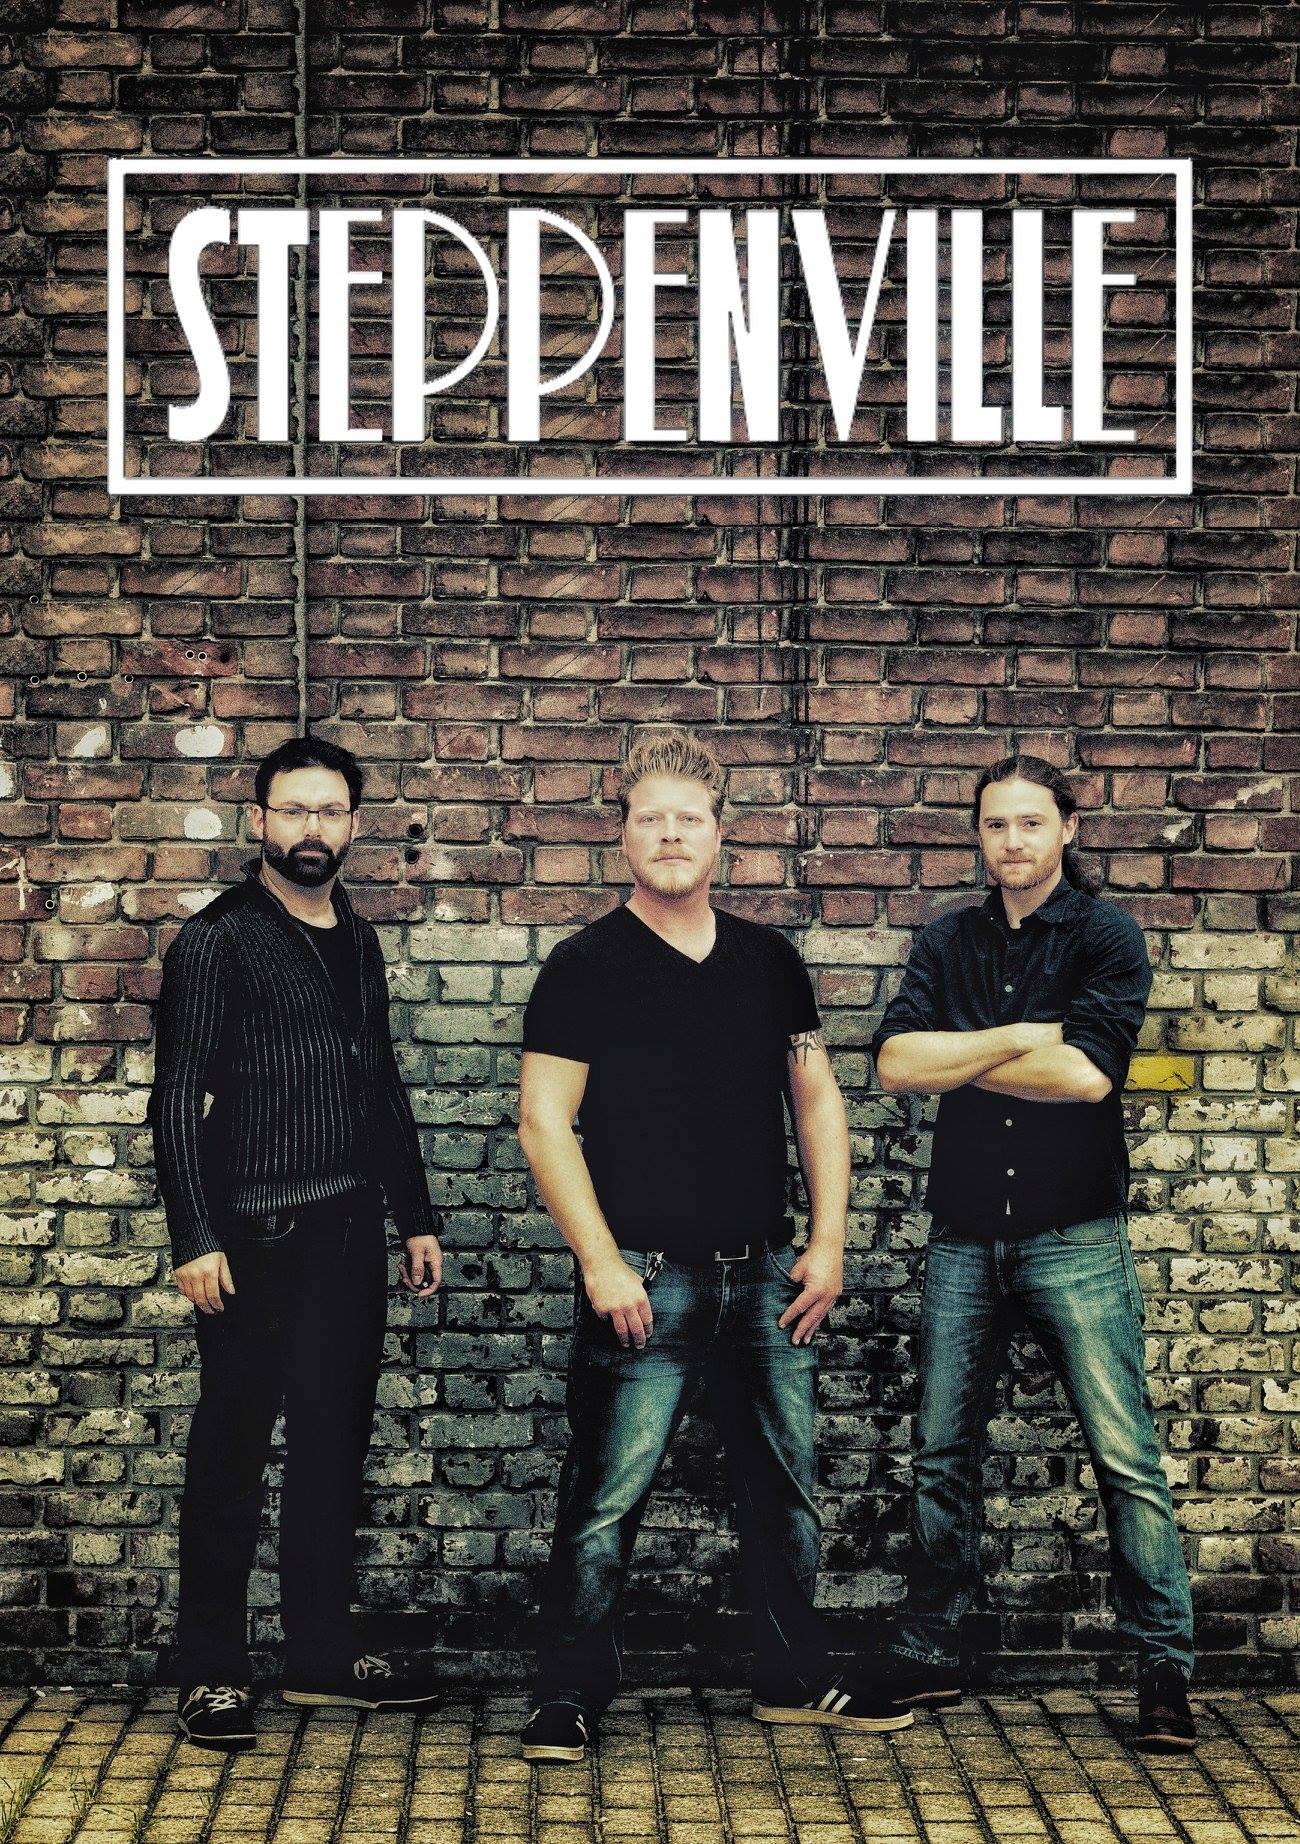 Steppenville